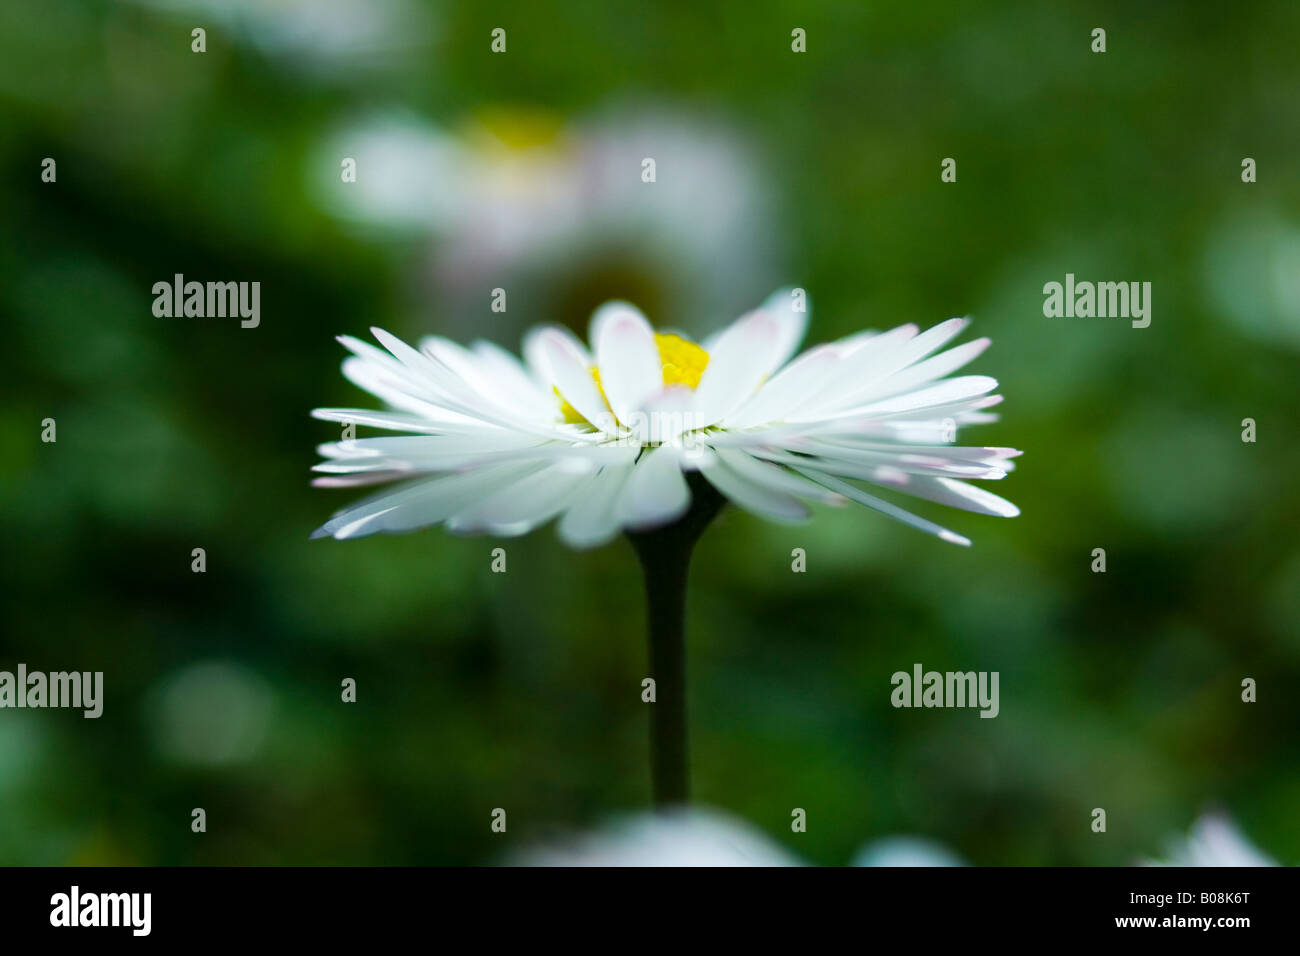 aster, asteraceae, bellis, daisy Stock Photo